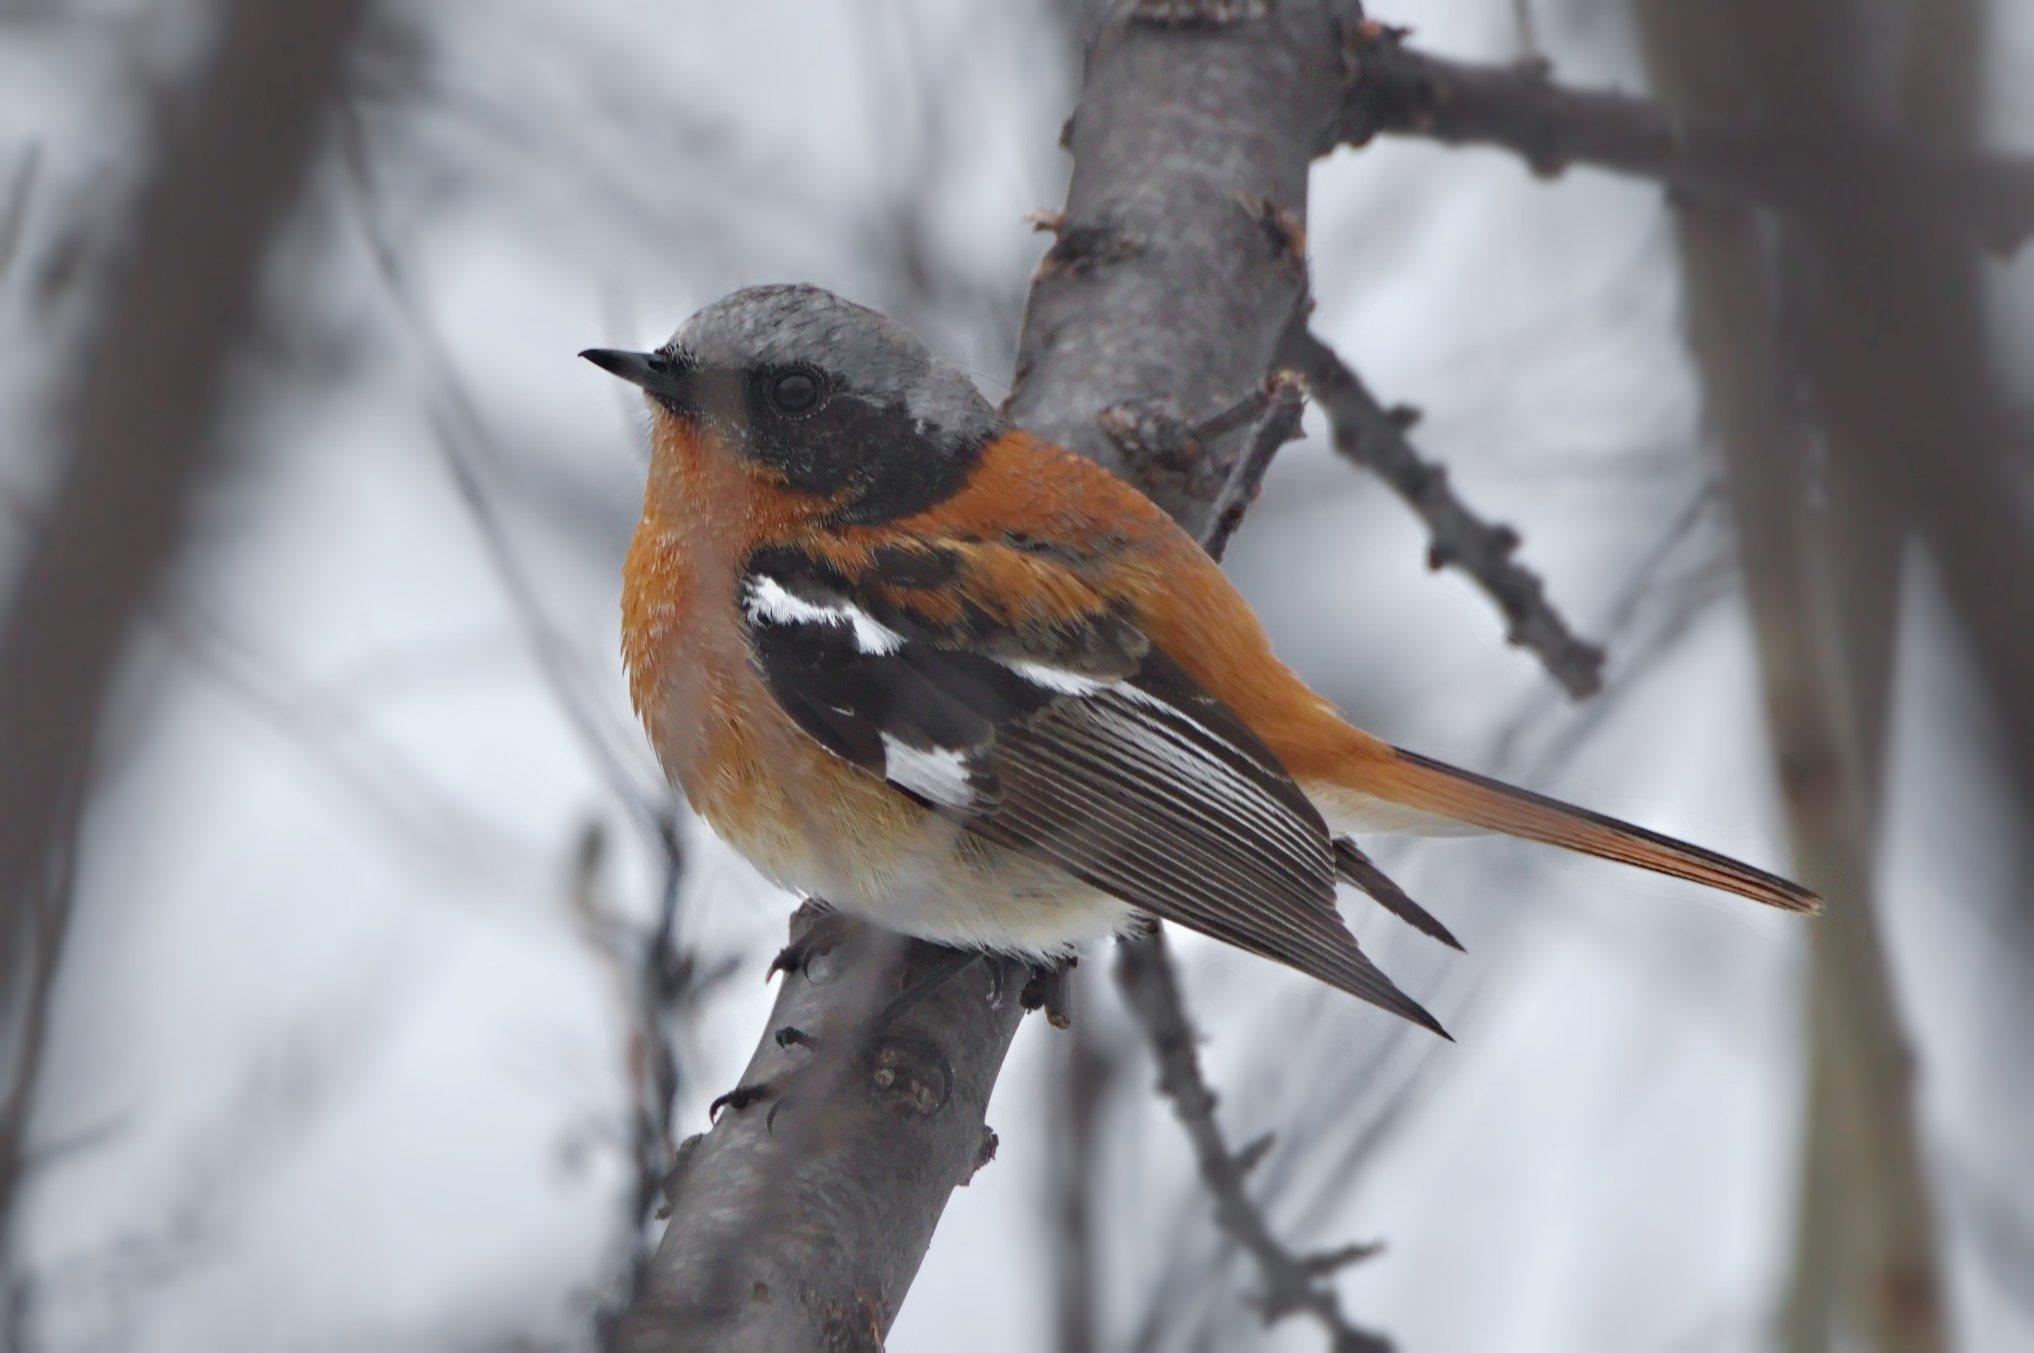 особи имеют птицы красноярска фото и названия приложения